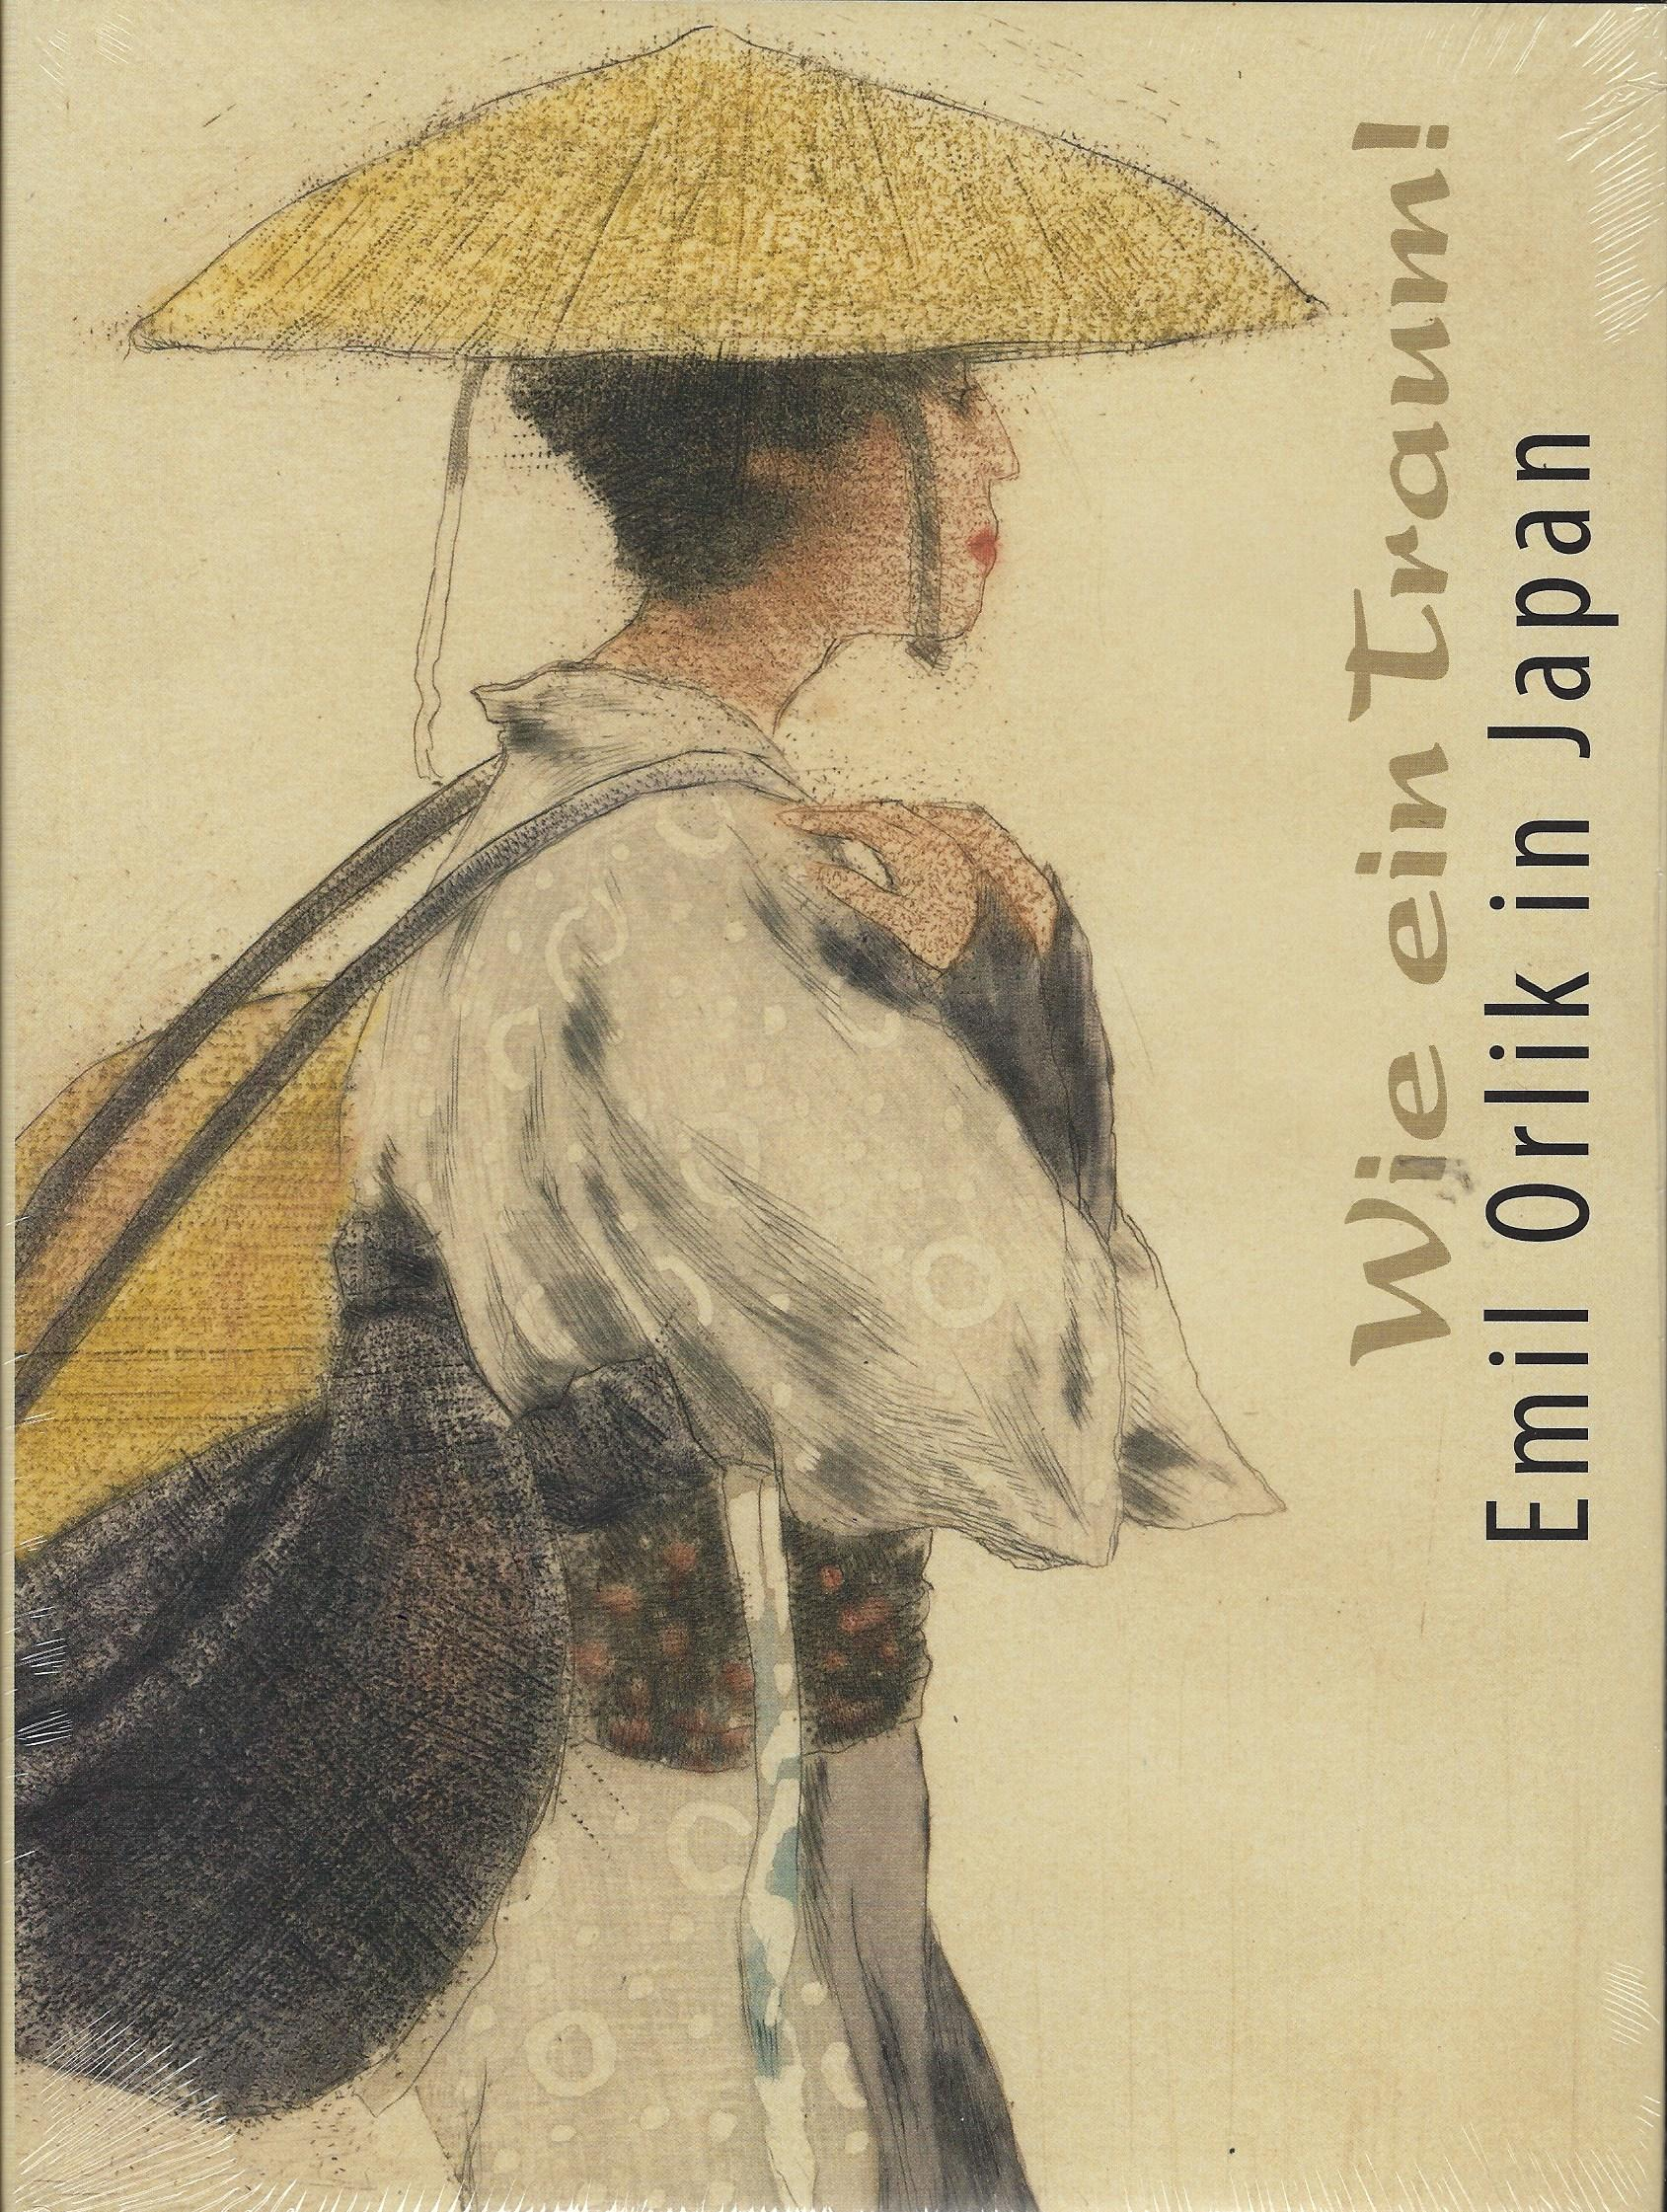 Emil Orlik in Japan.